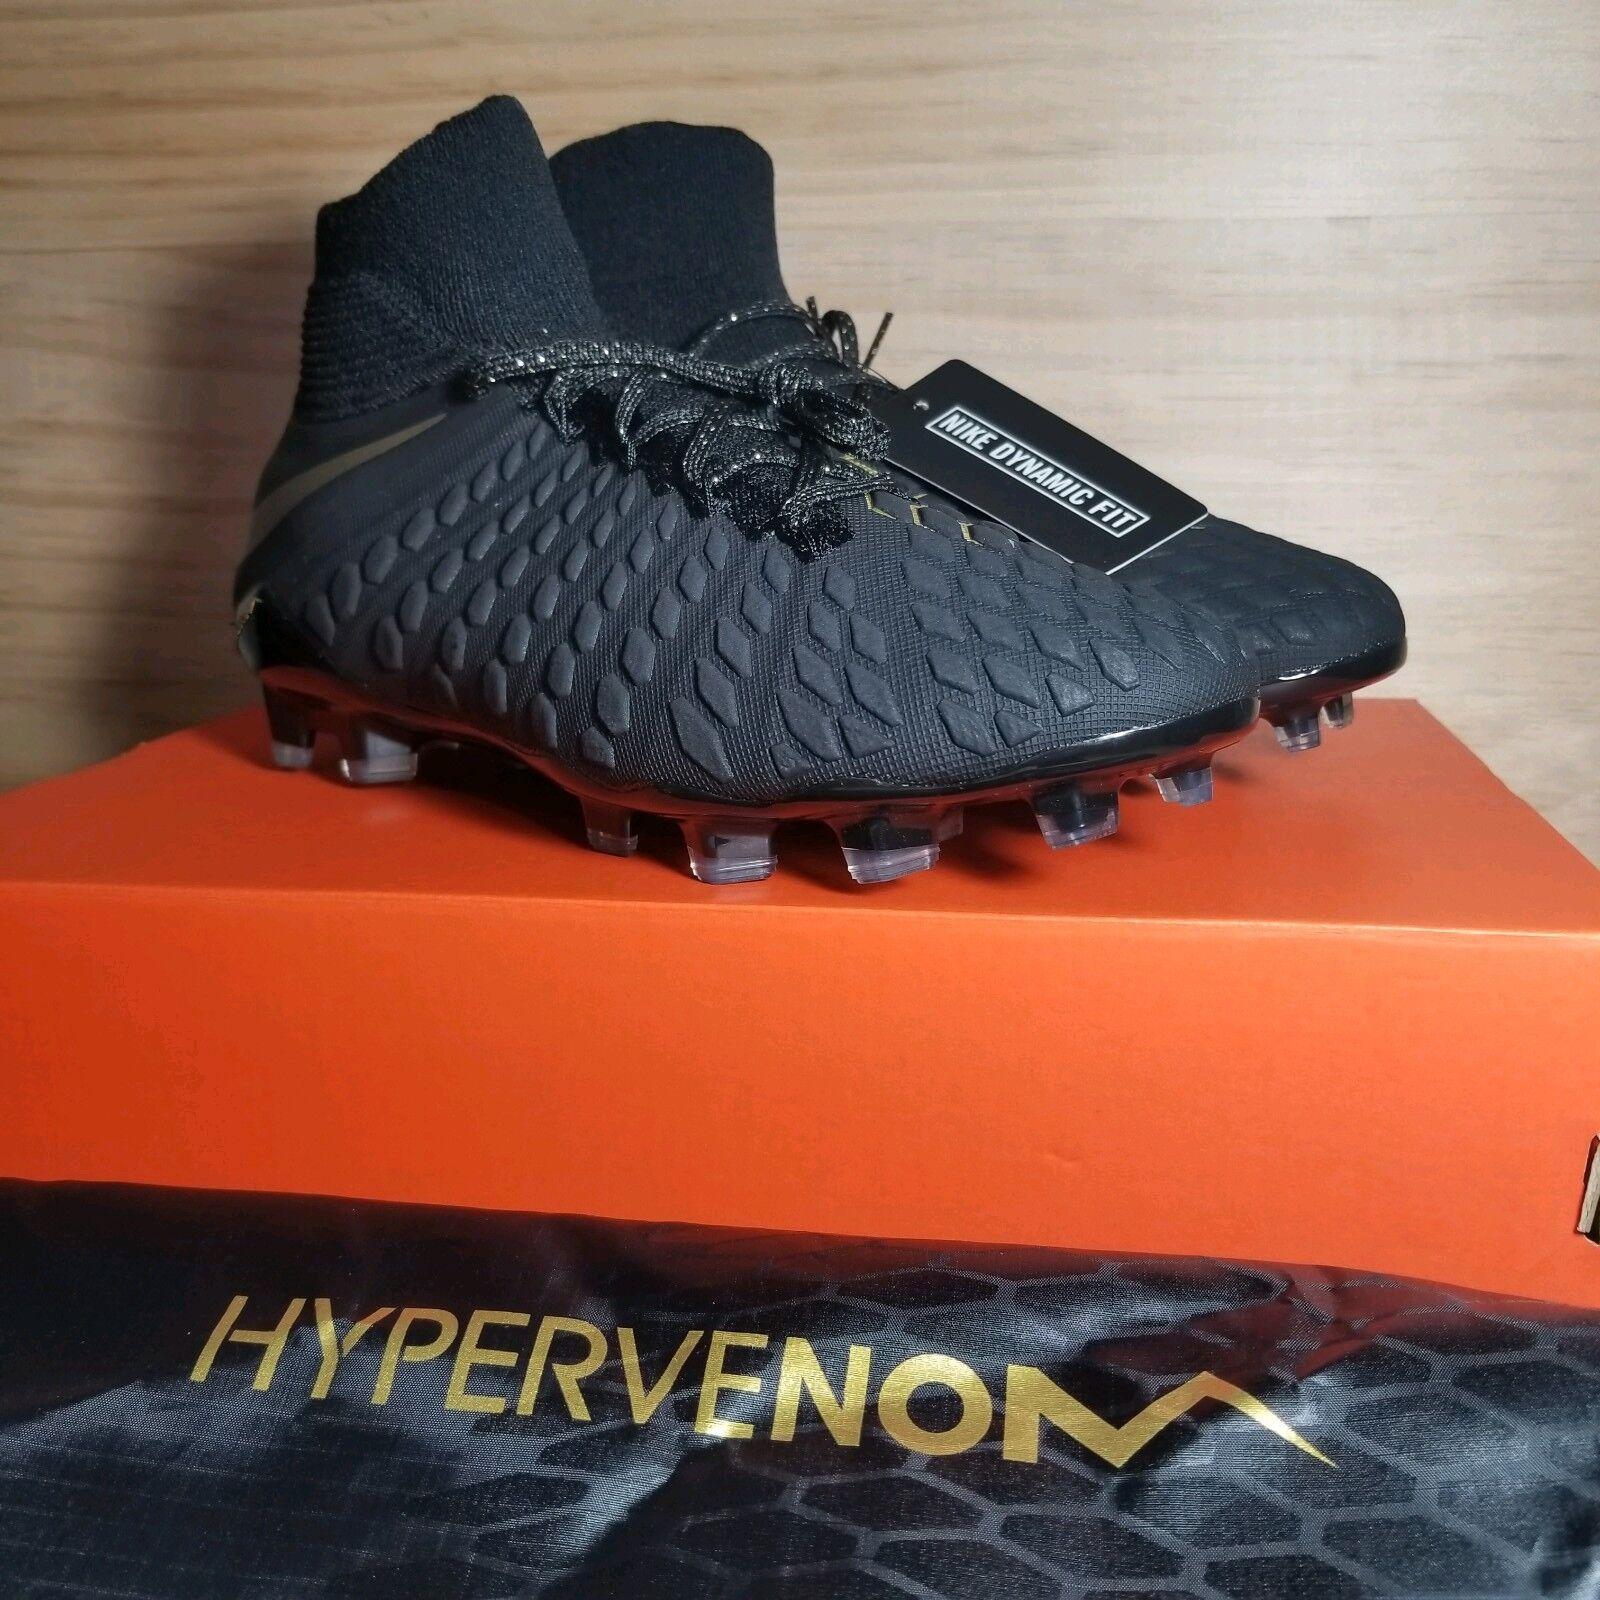 a5ed1d228 Nike Nike Nike Mens Hypervenom 3 Elite DF FG Soccer Cleats  AJ3803 090  Size